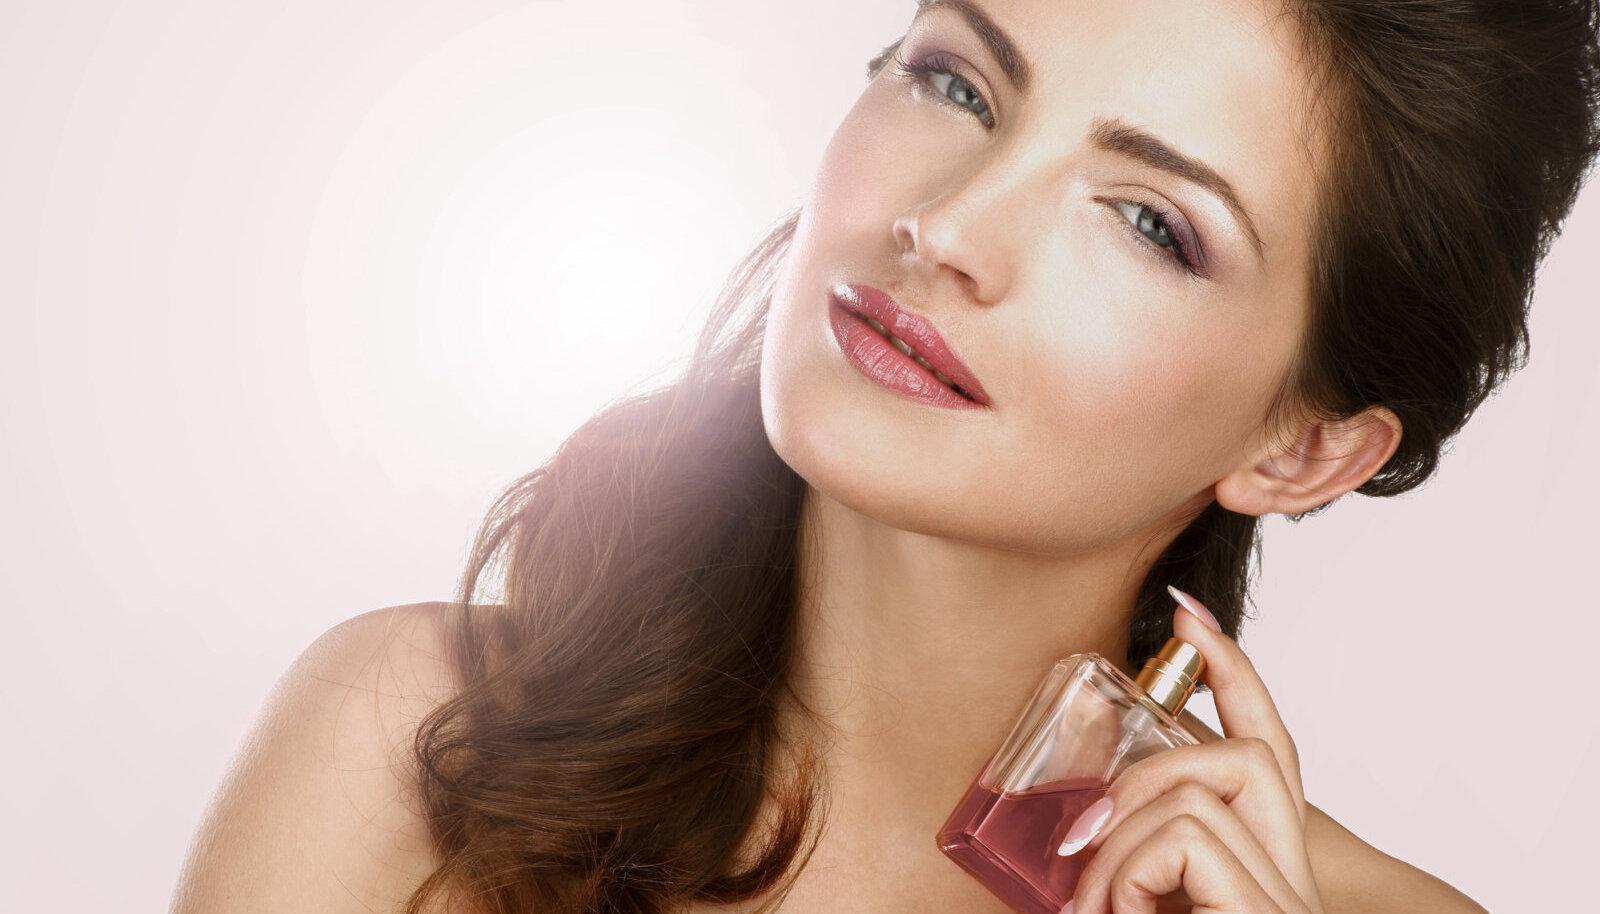 Millist parfüümi eelistad sina?